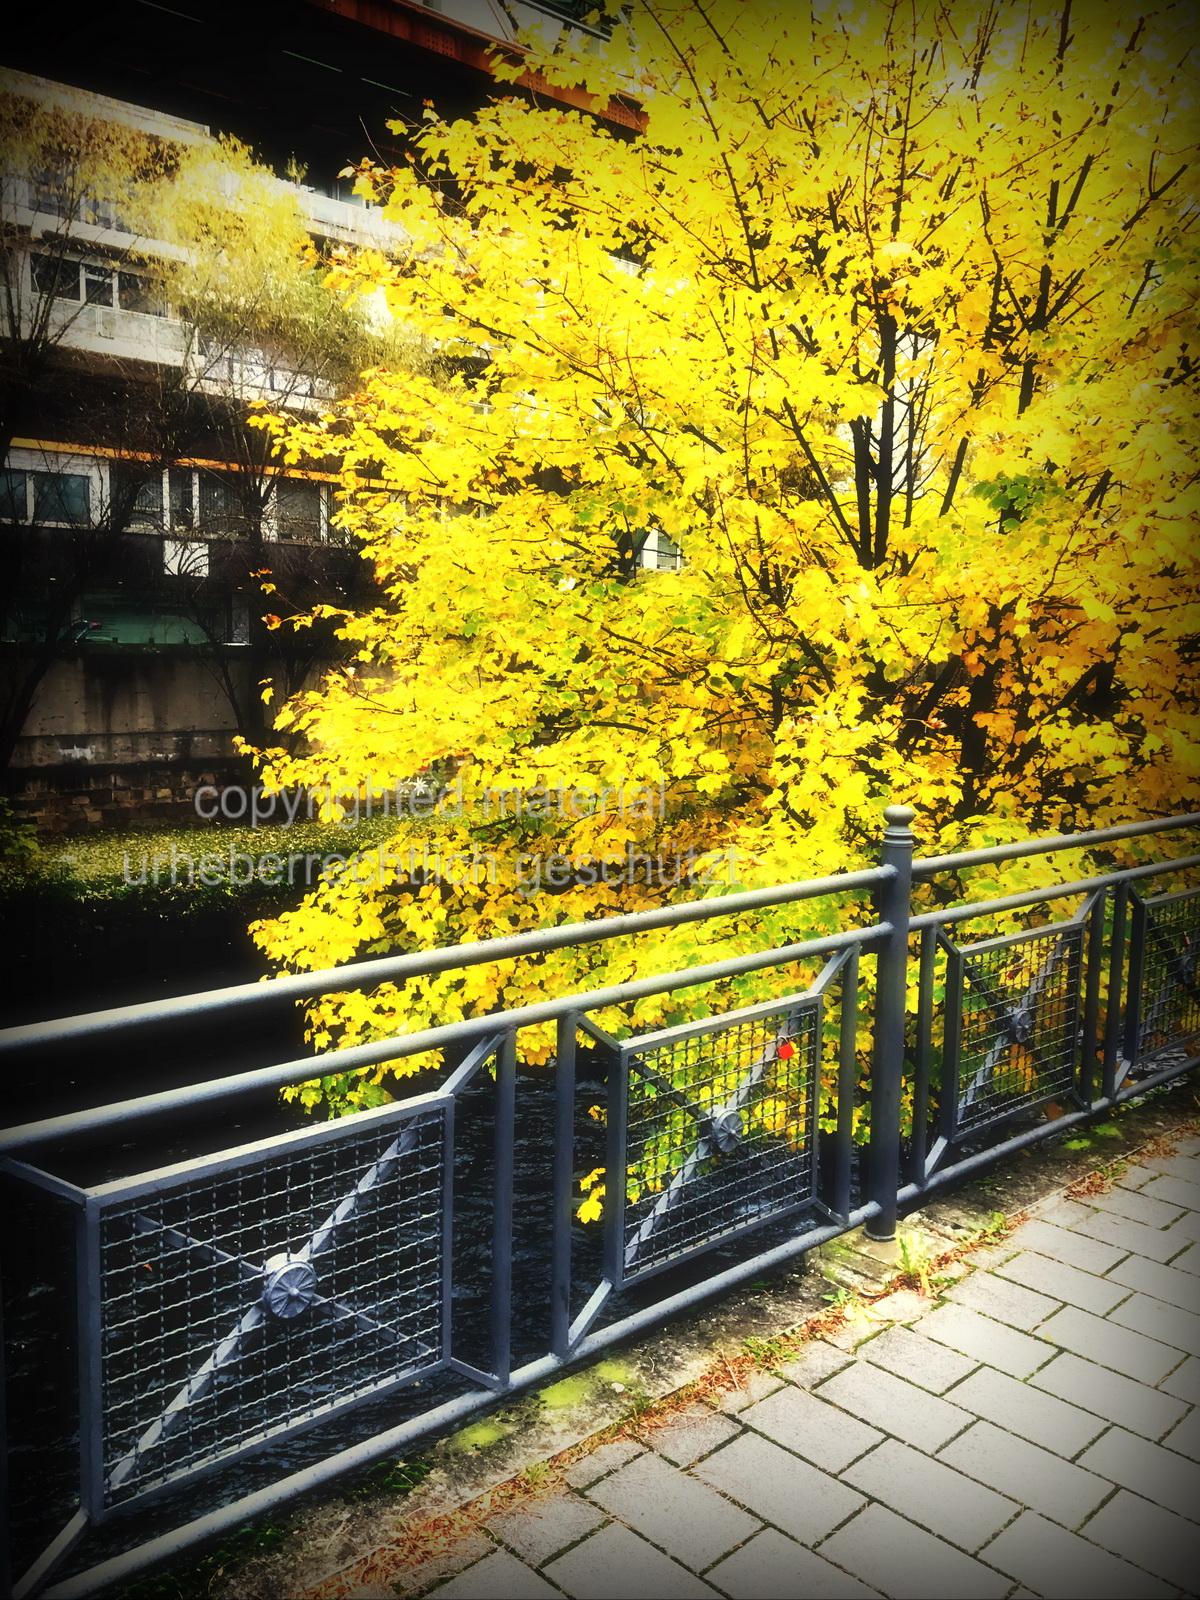 5 Momente im Herbst – Farbe und Linien in Wuppertal Elberfeld